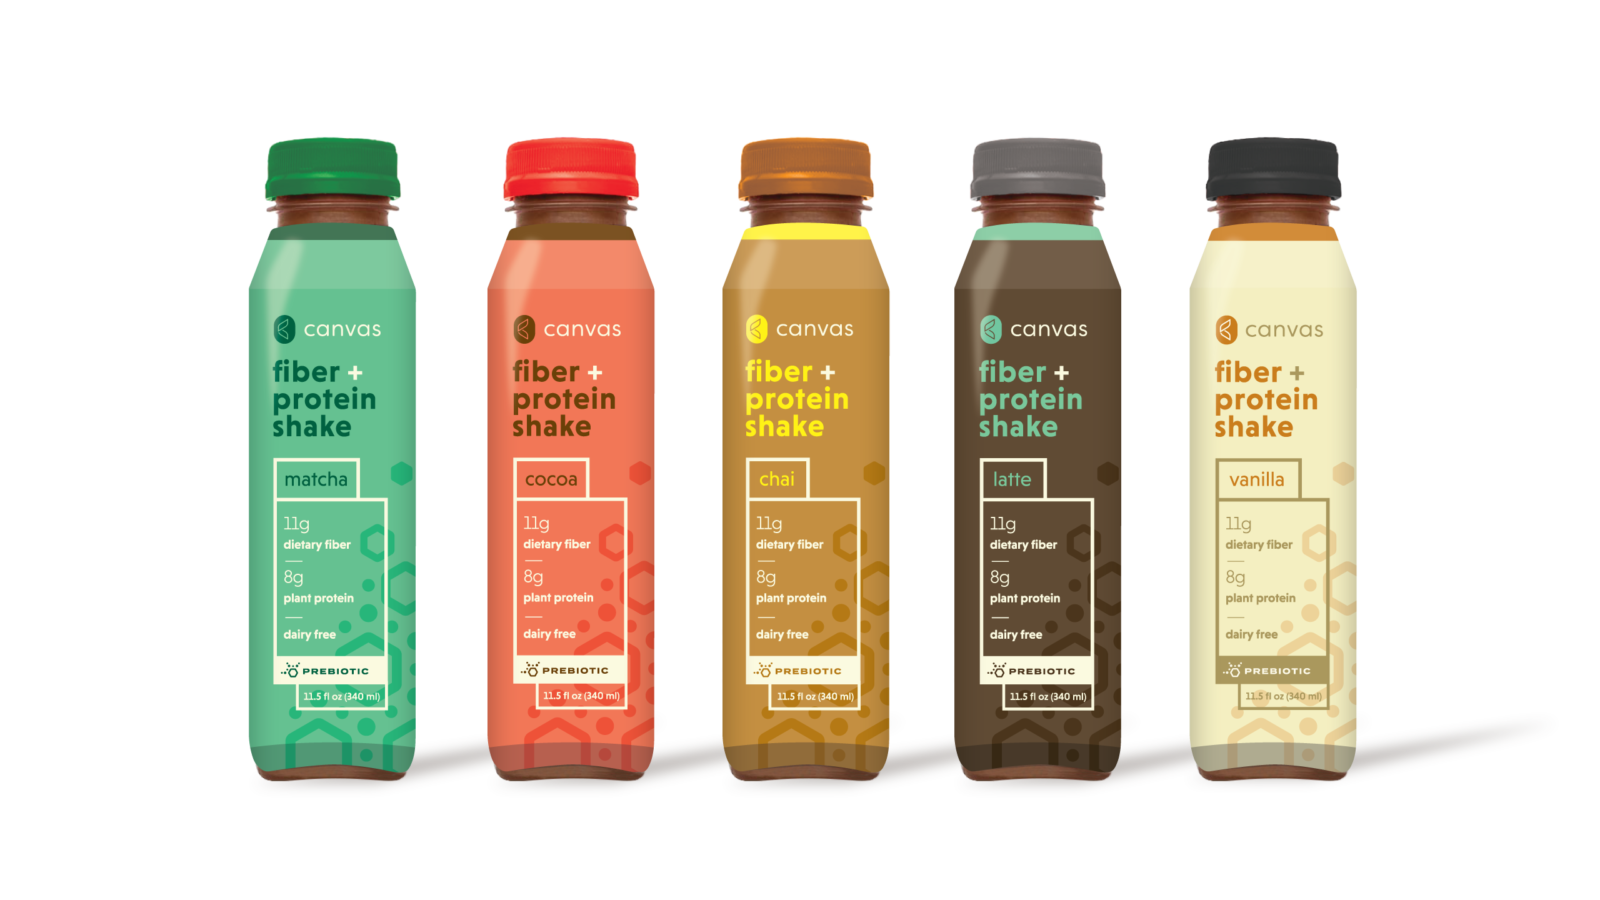 Canvas Fiber + Protein Shakes - Beverage Packaging Design